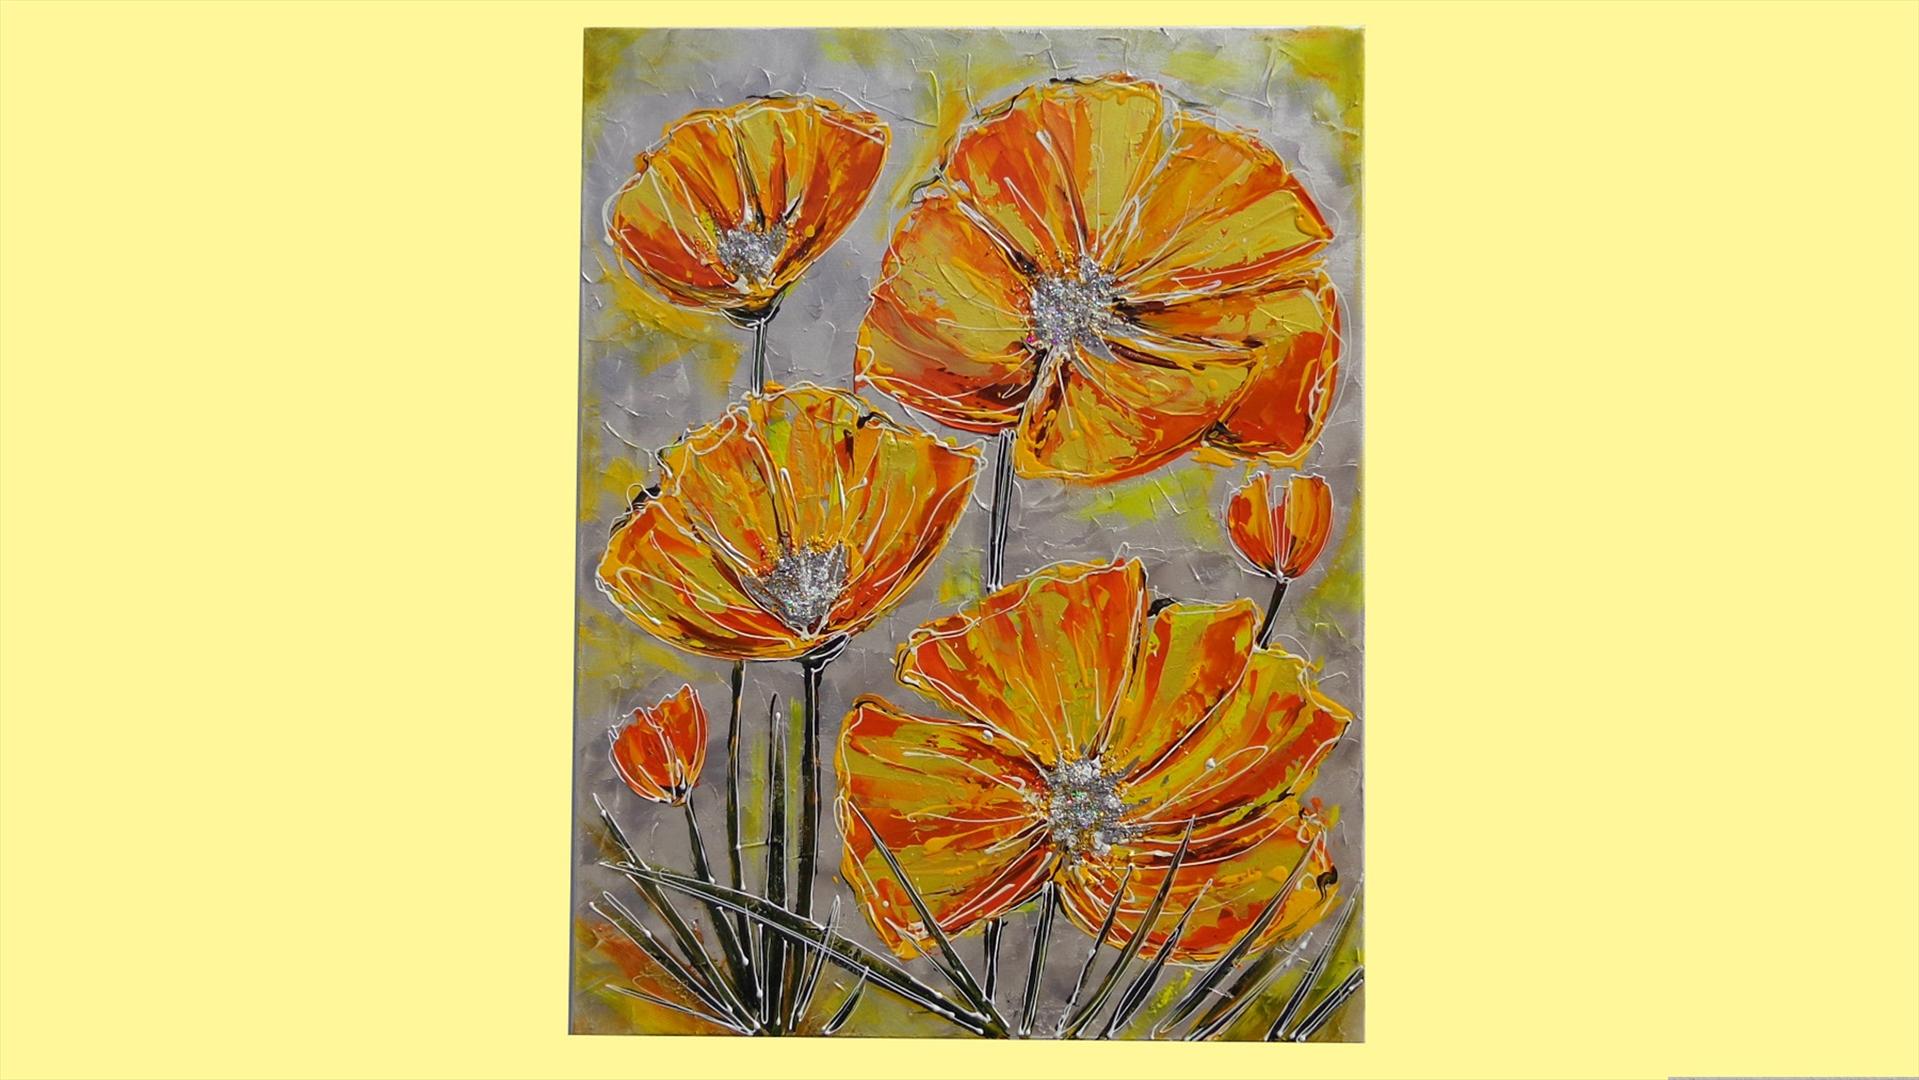 Papaveri moderni arancioni vendita quadri online for Dipinti a mano moderni